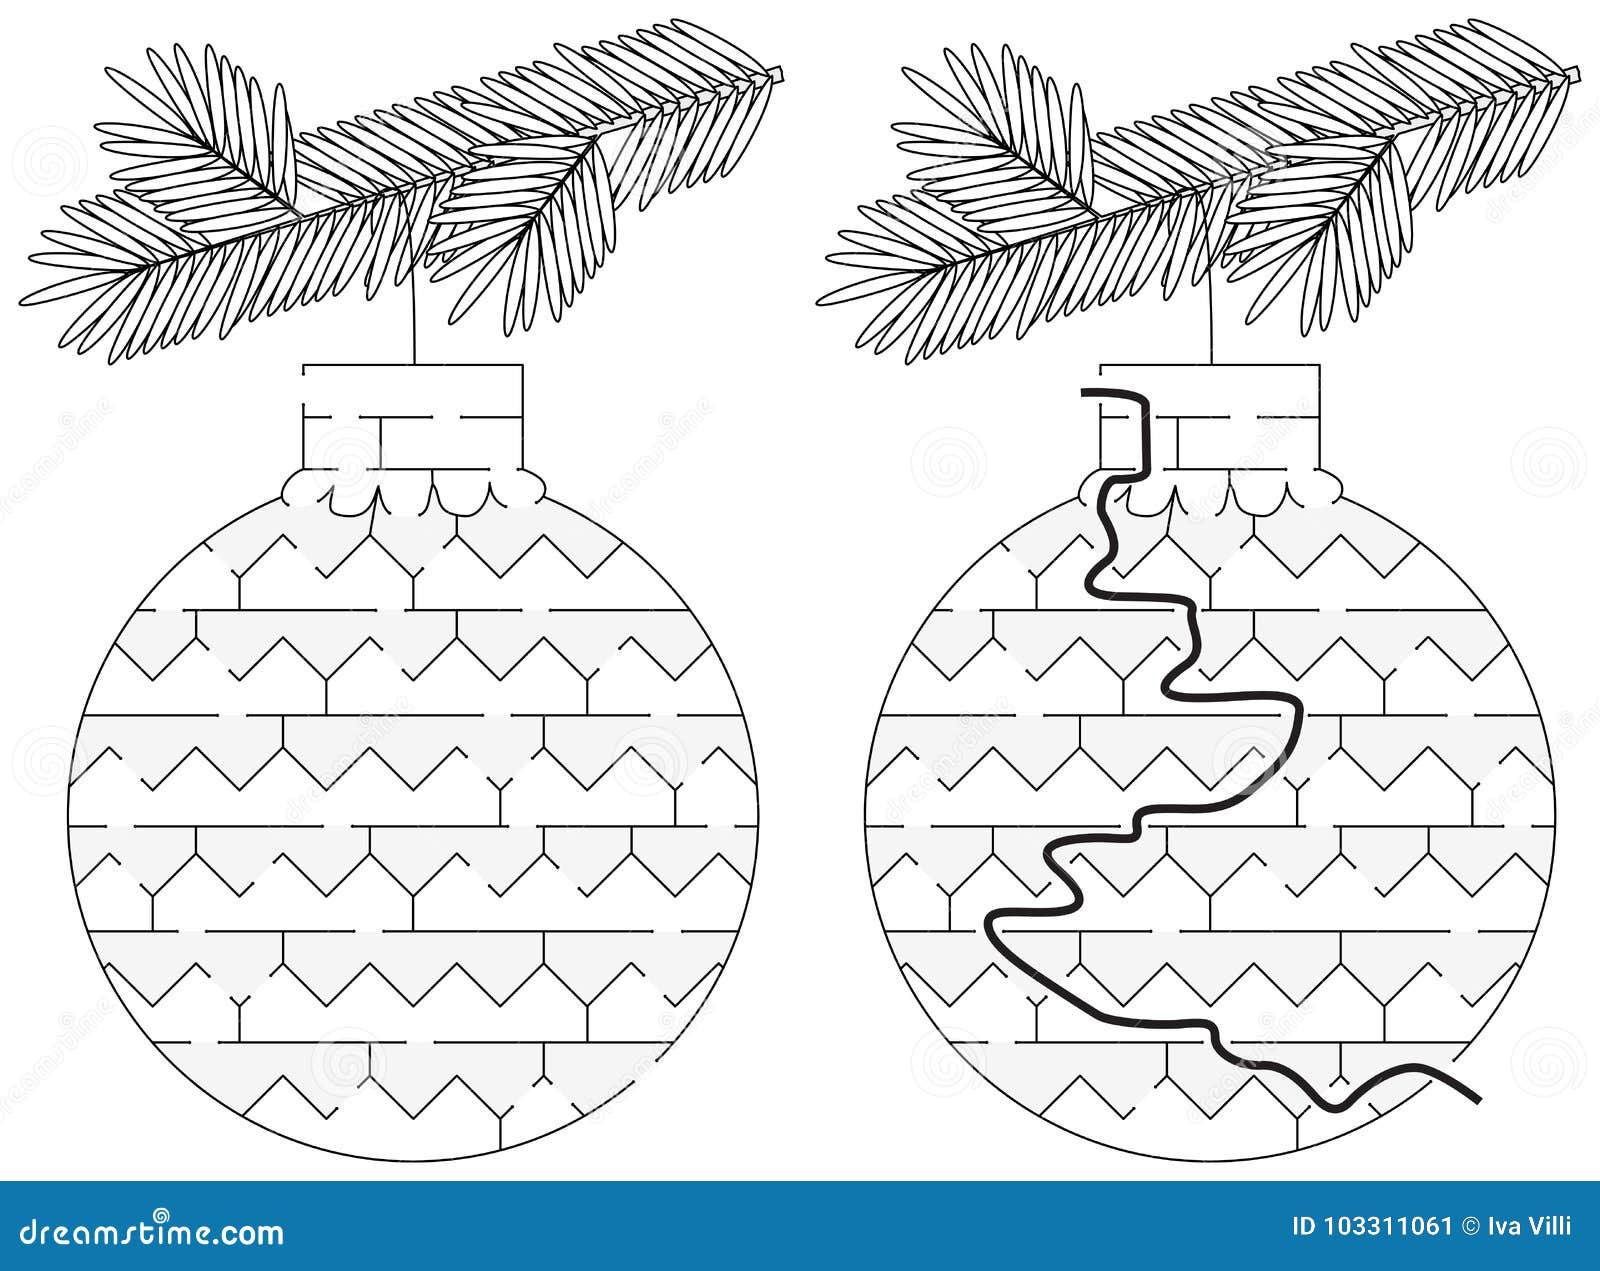 Easy Christmas ornament maze